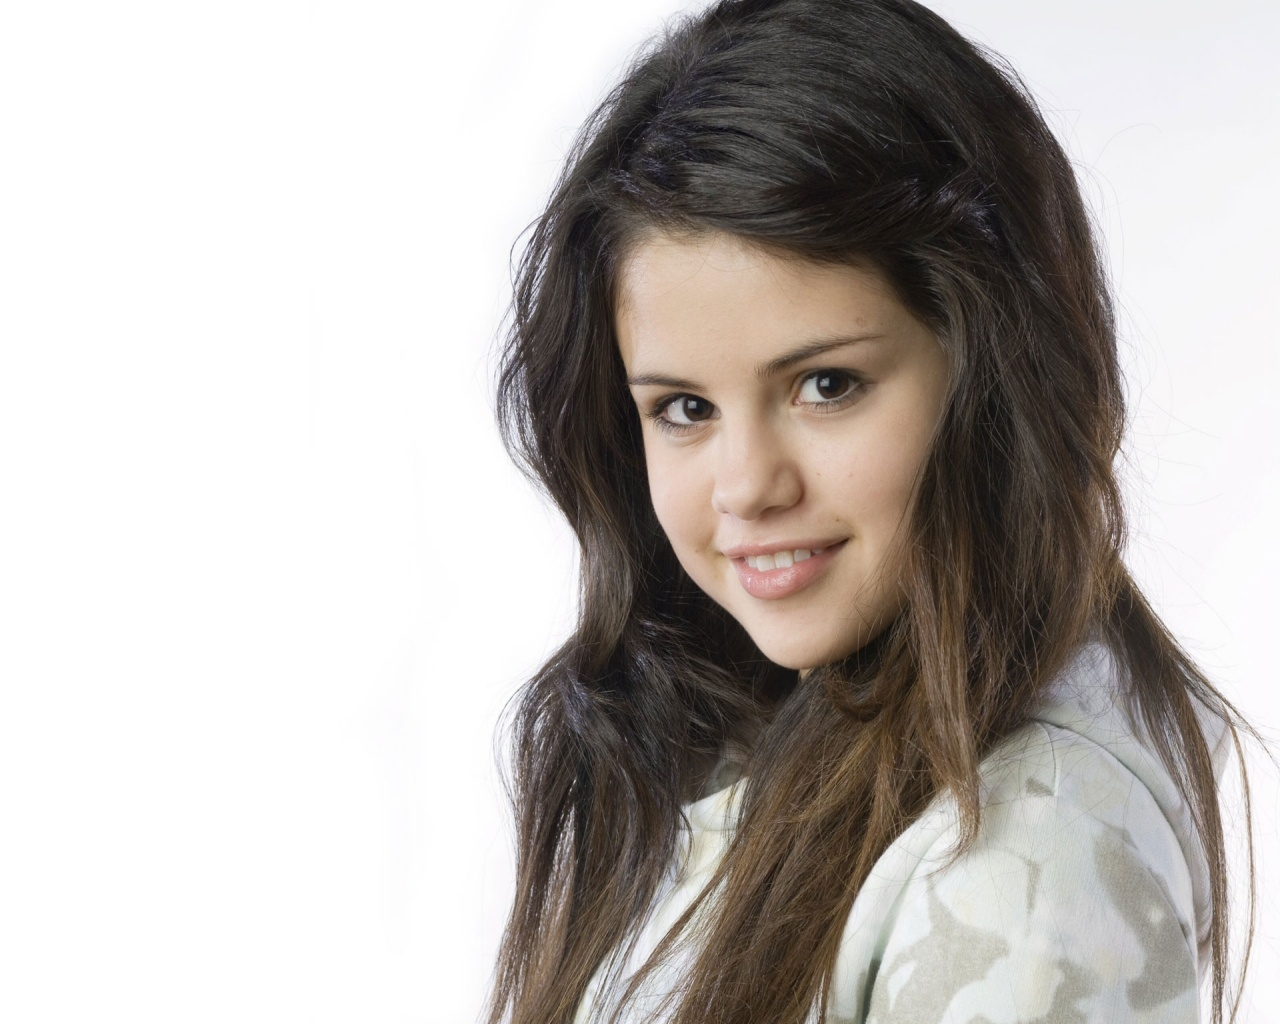 Free Selena Gomez Hd Wallpapers: HD Wallpapers: Selena Gomez HD Wallpapers